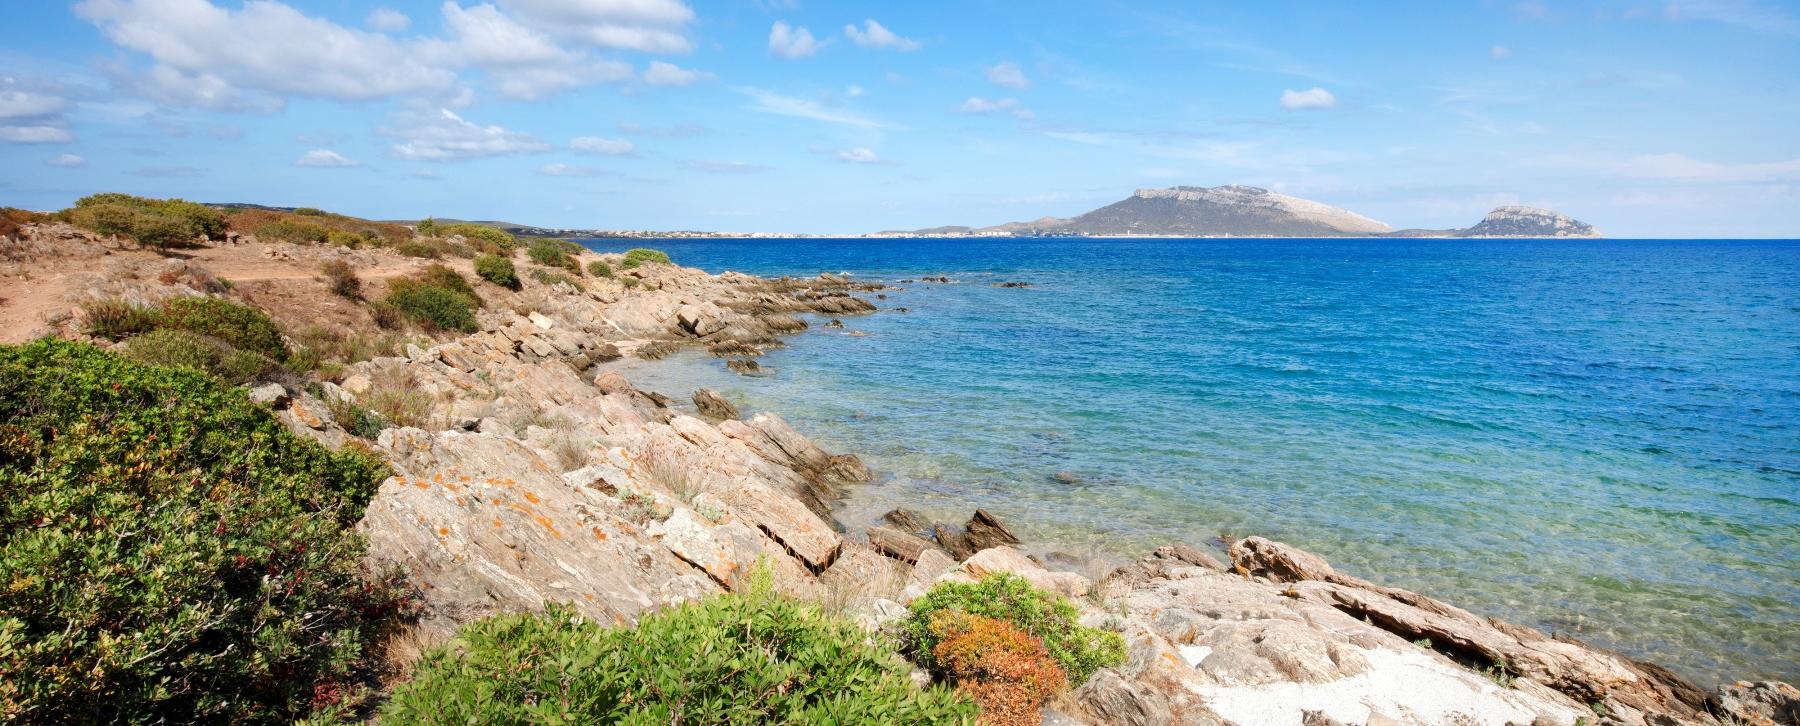 Sardegna - Italia